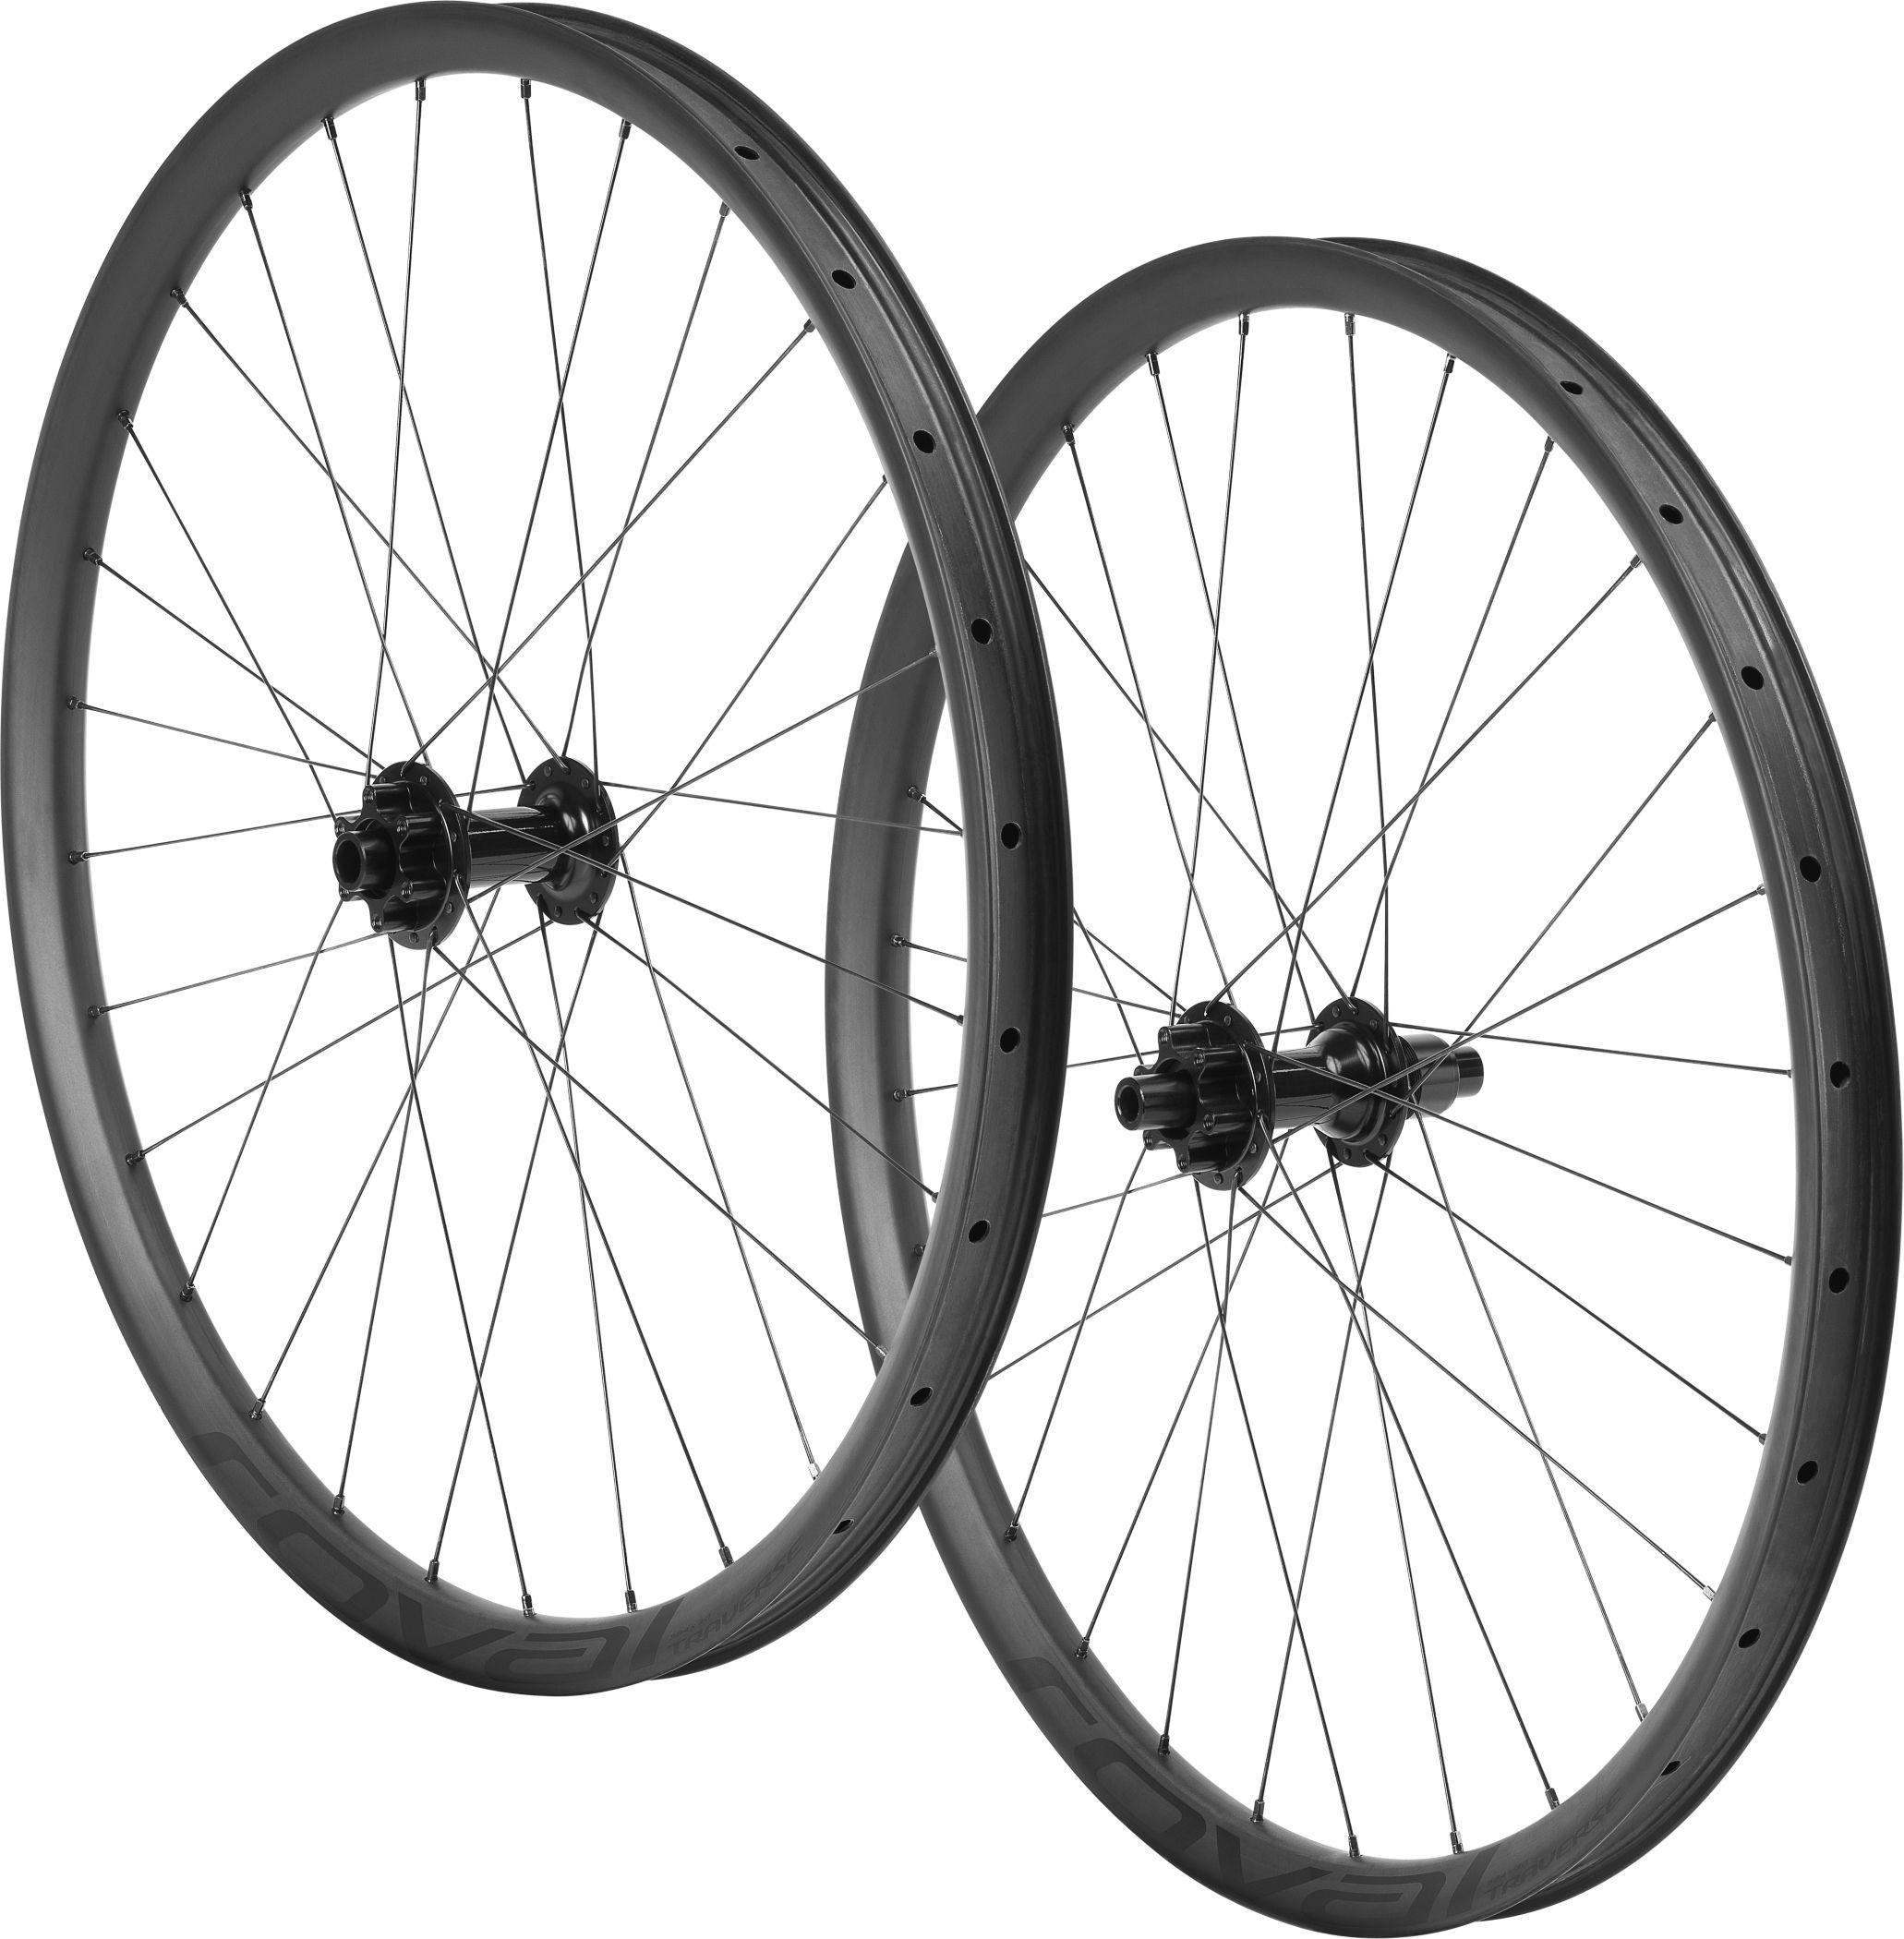 Roval Traverse 27.5 Carbon 148 Mtb Wheelset 2020 | Wheelset